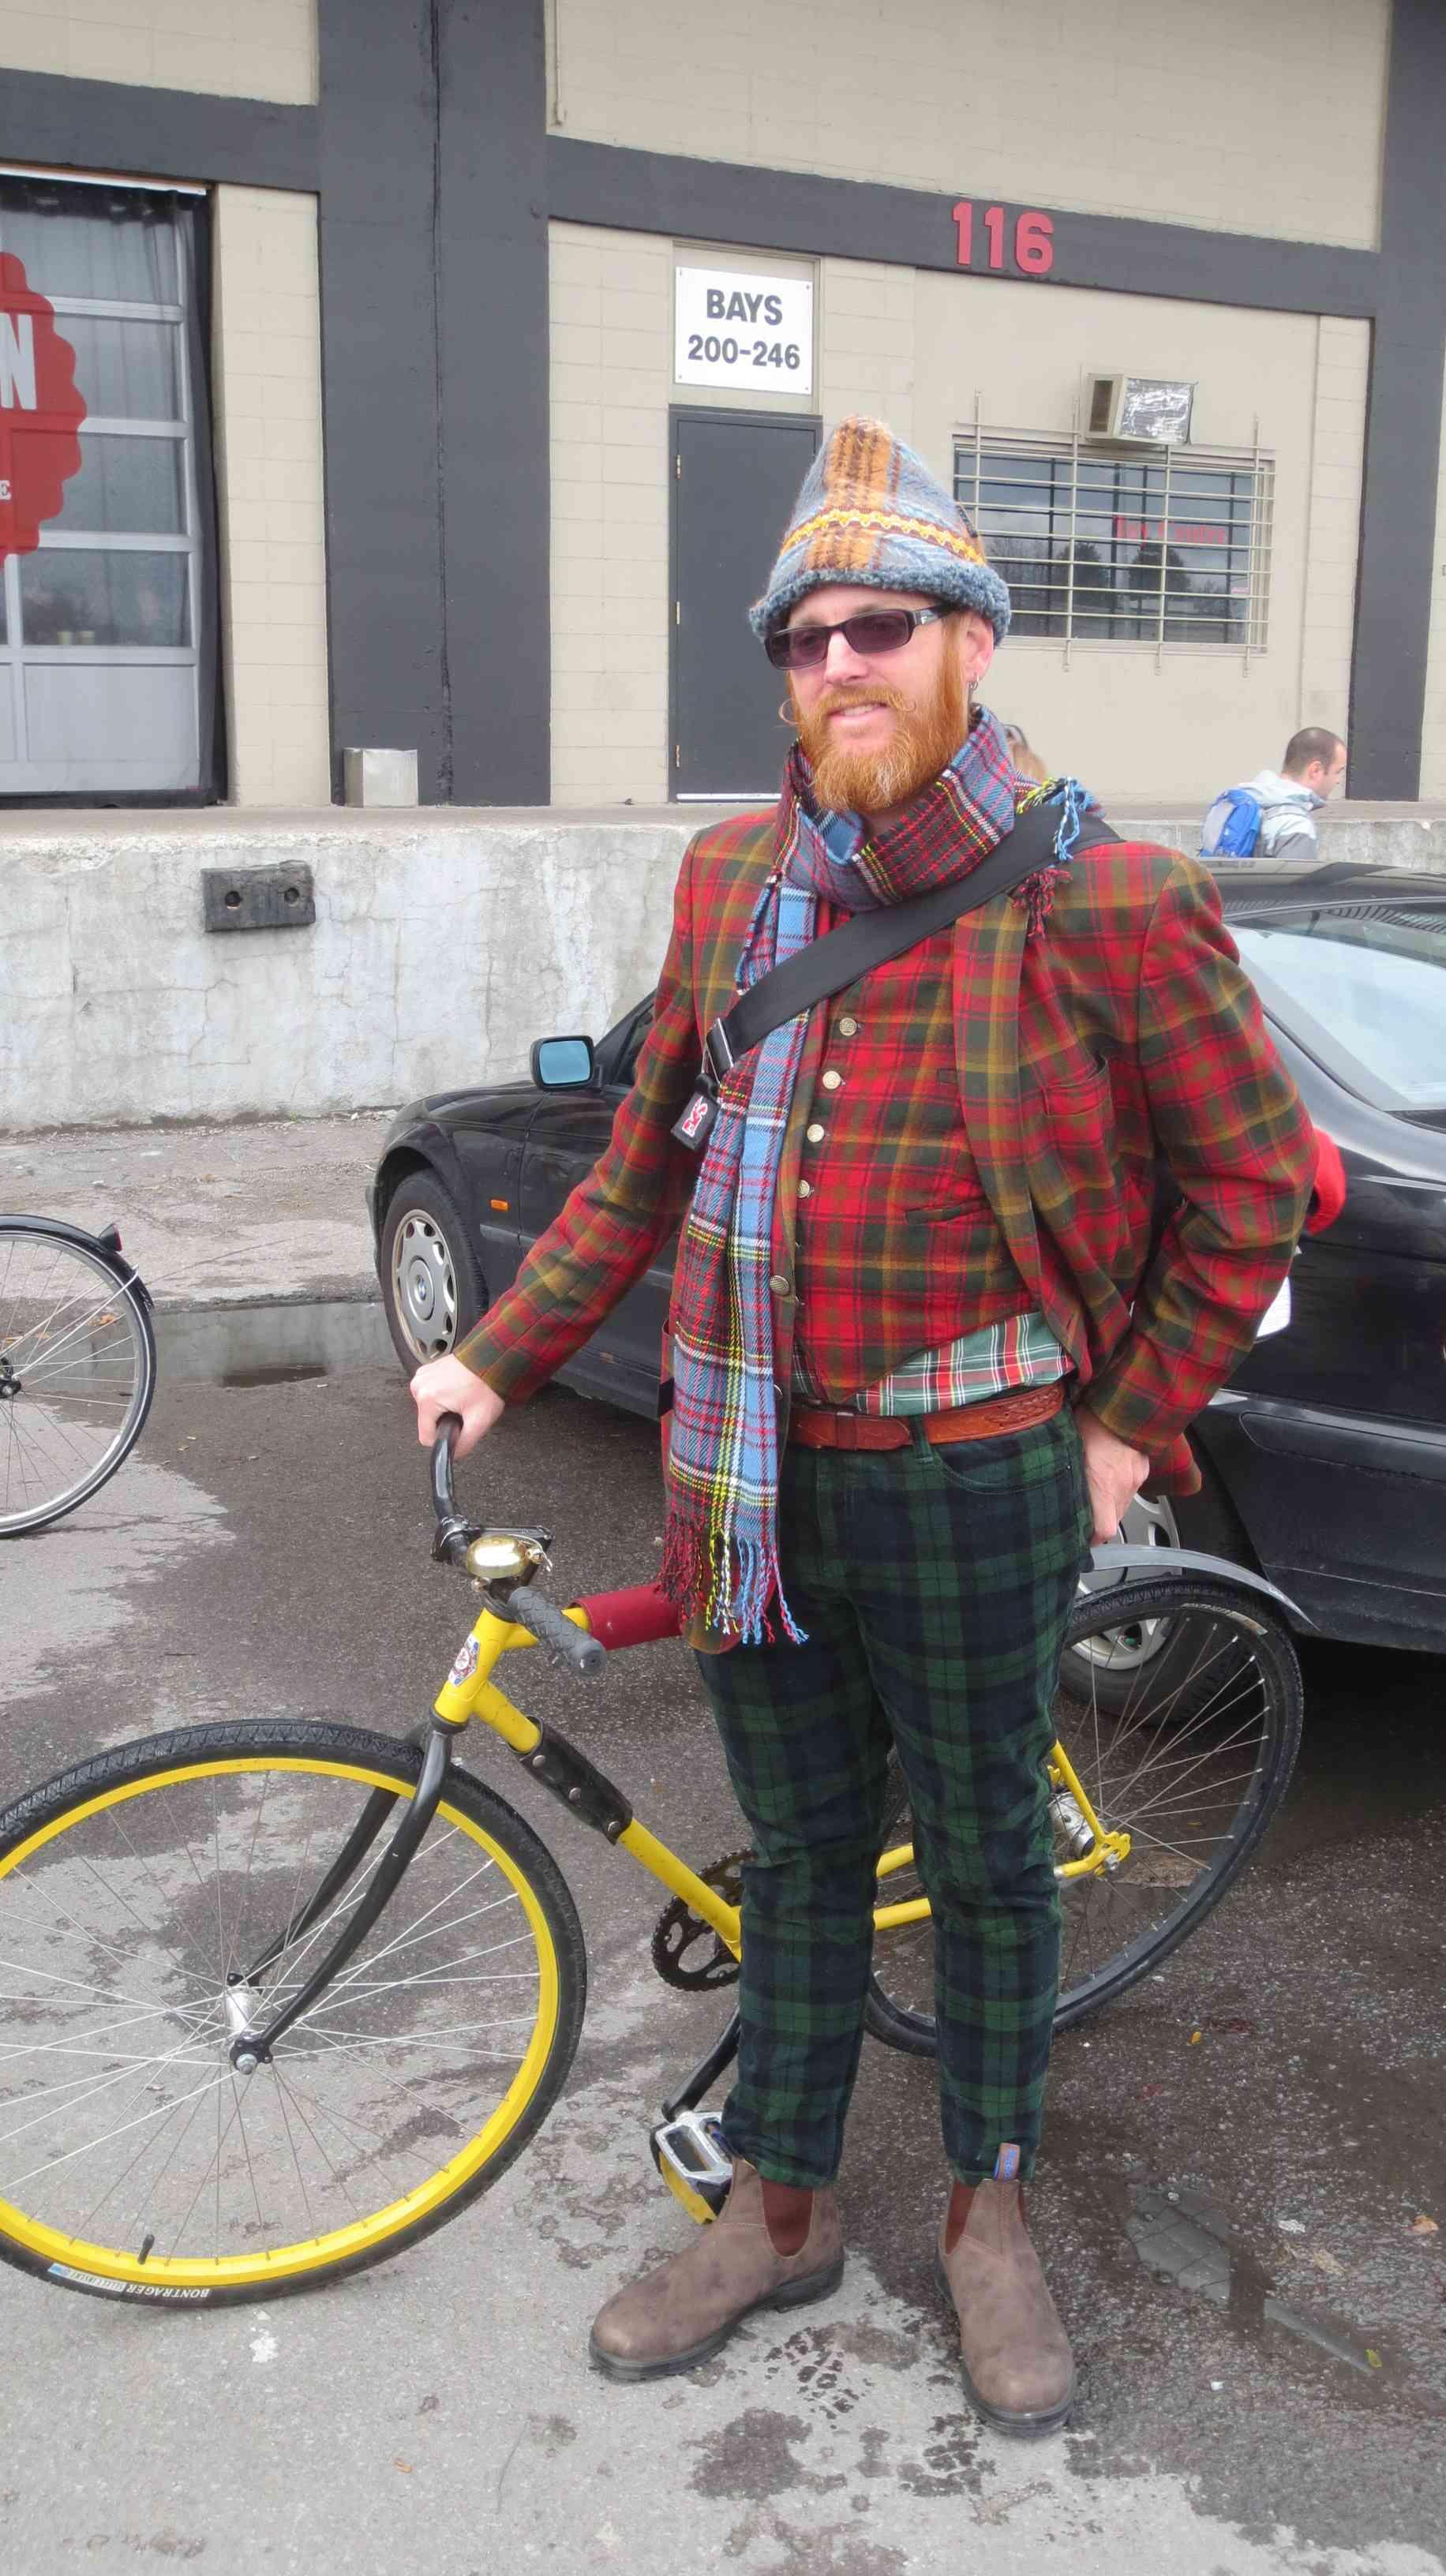 2013 10 27 Ottawa Plaid Parade – Hans Moor 11